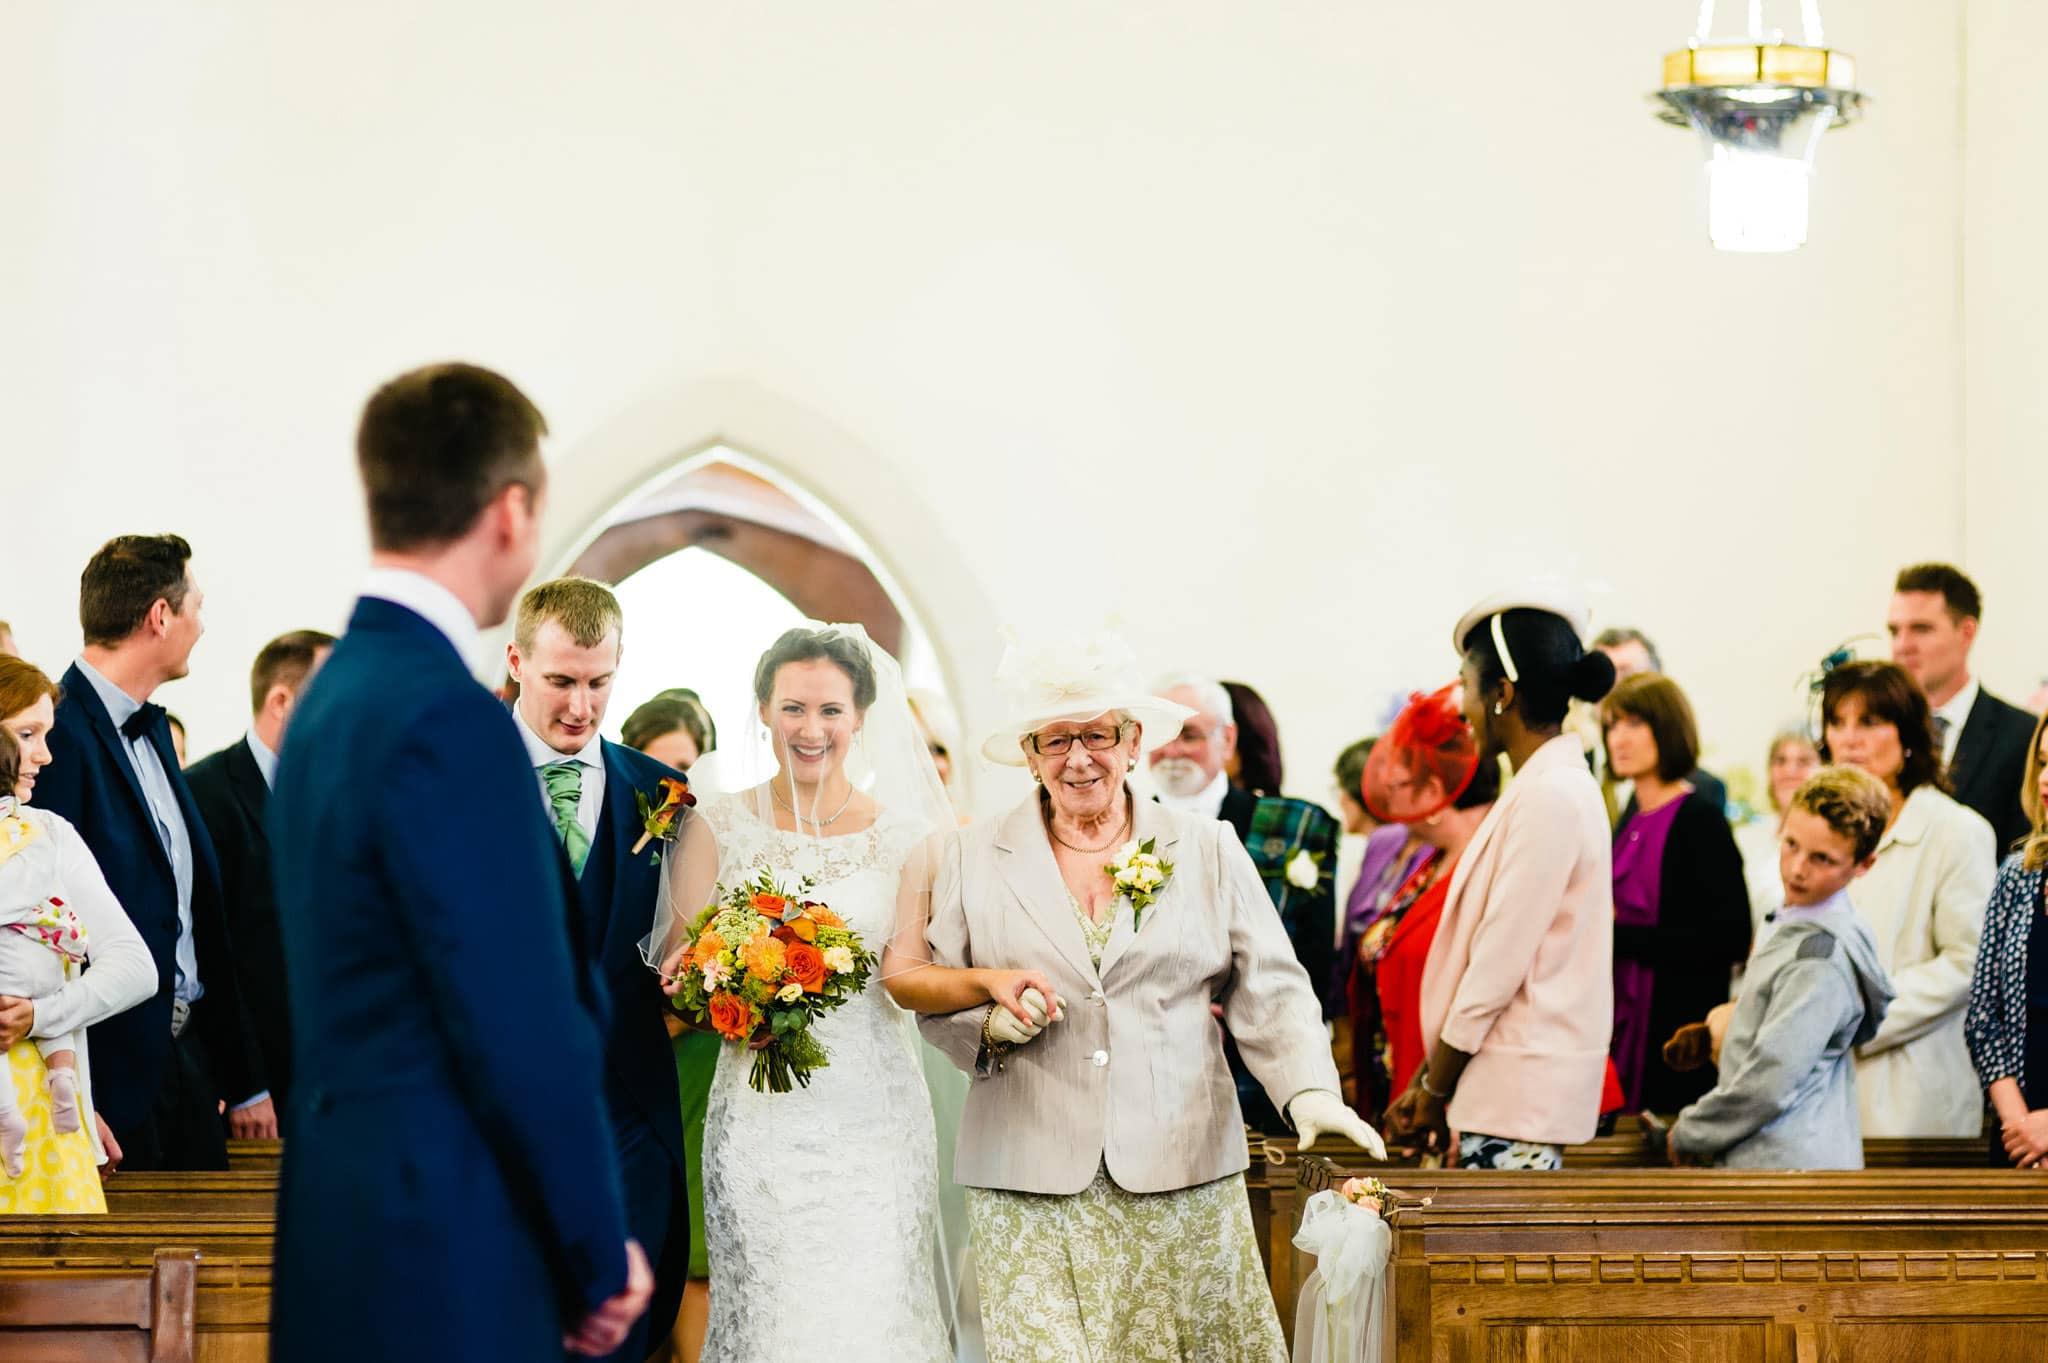 Wedding photography at Y Talbot Hotel in Tregaron, Wales   Tina + Phil 18